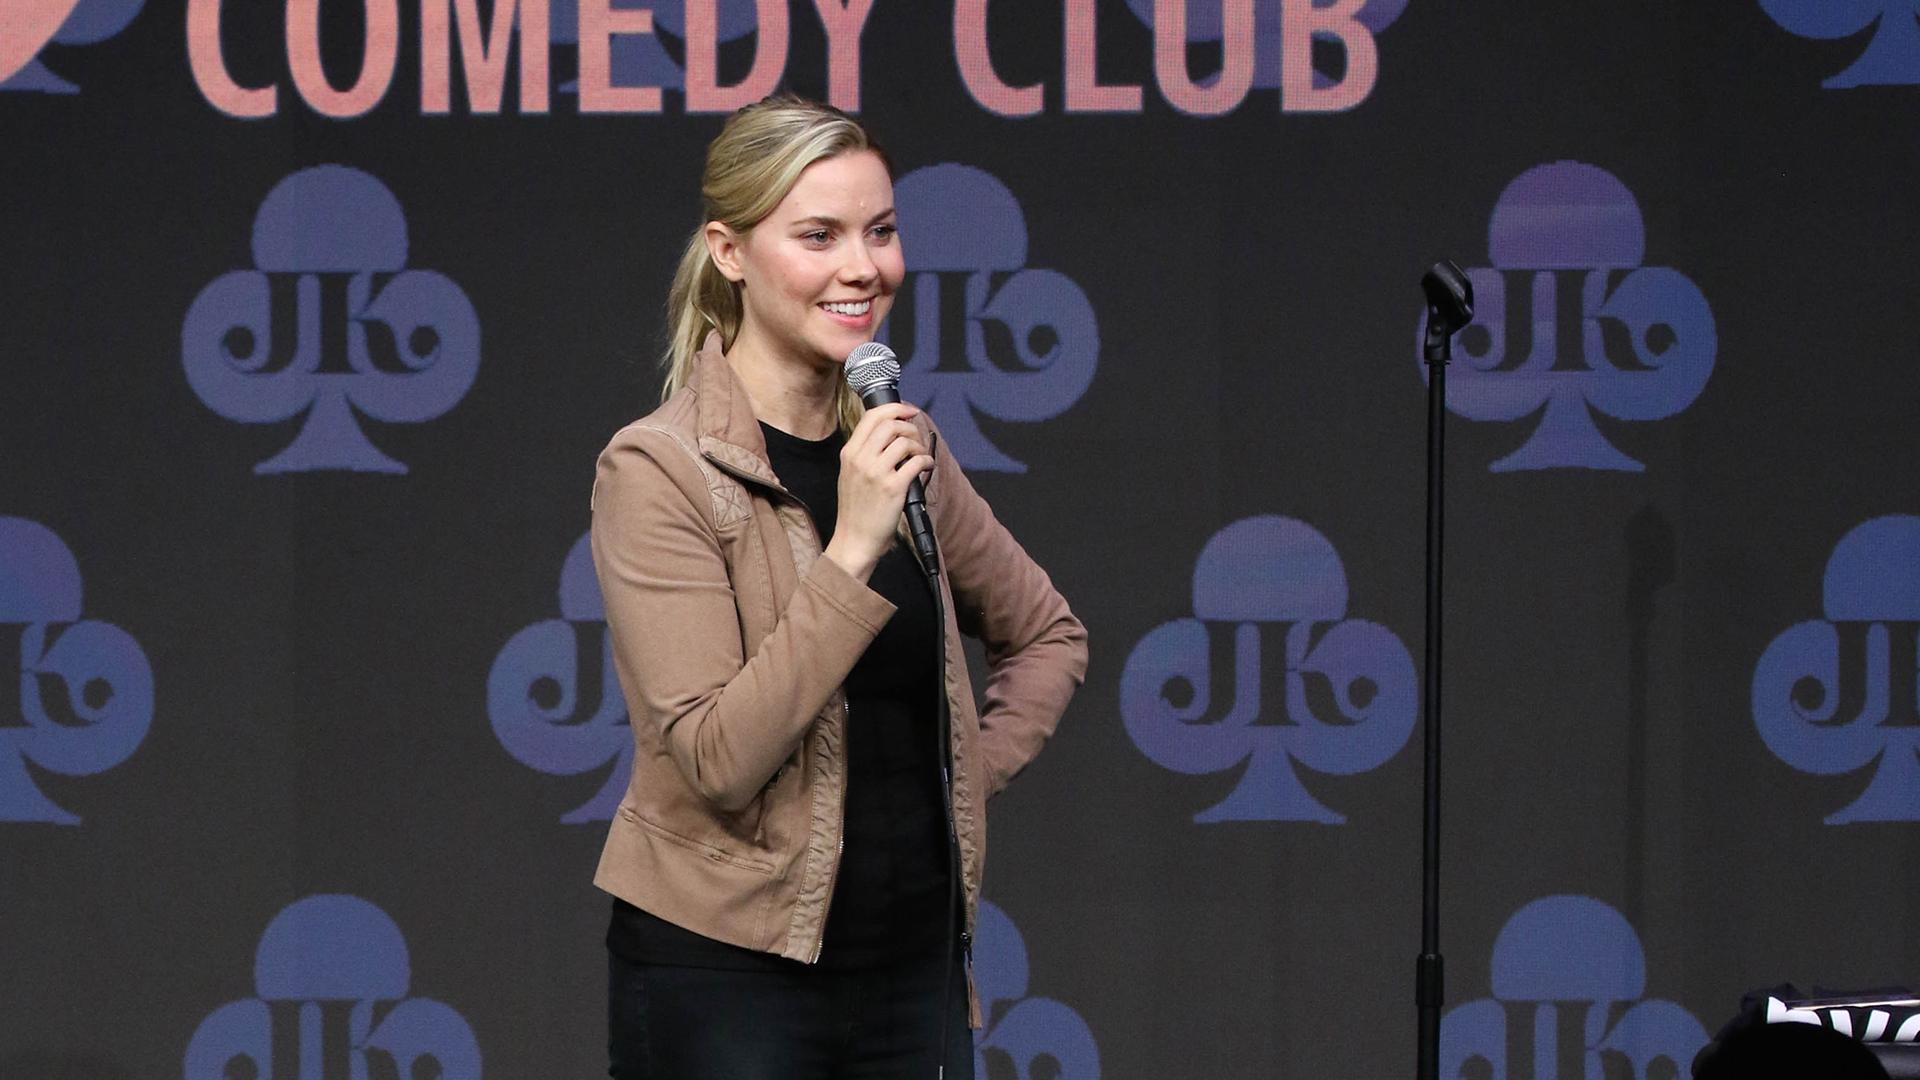 Jimmy Kimmel's Comedy Club - Jimmy Kimmel's Comedy Club: Kelsey Cook